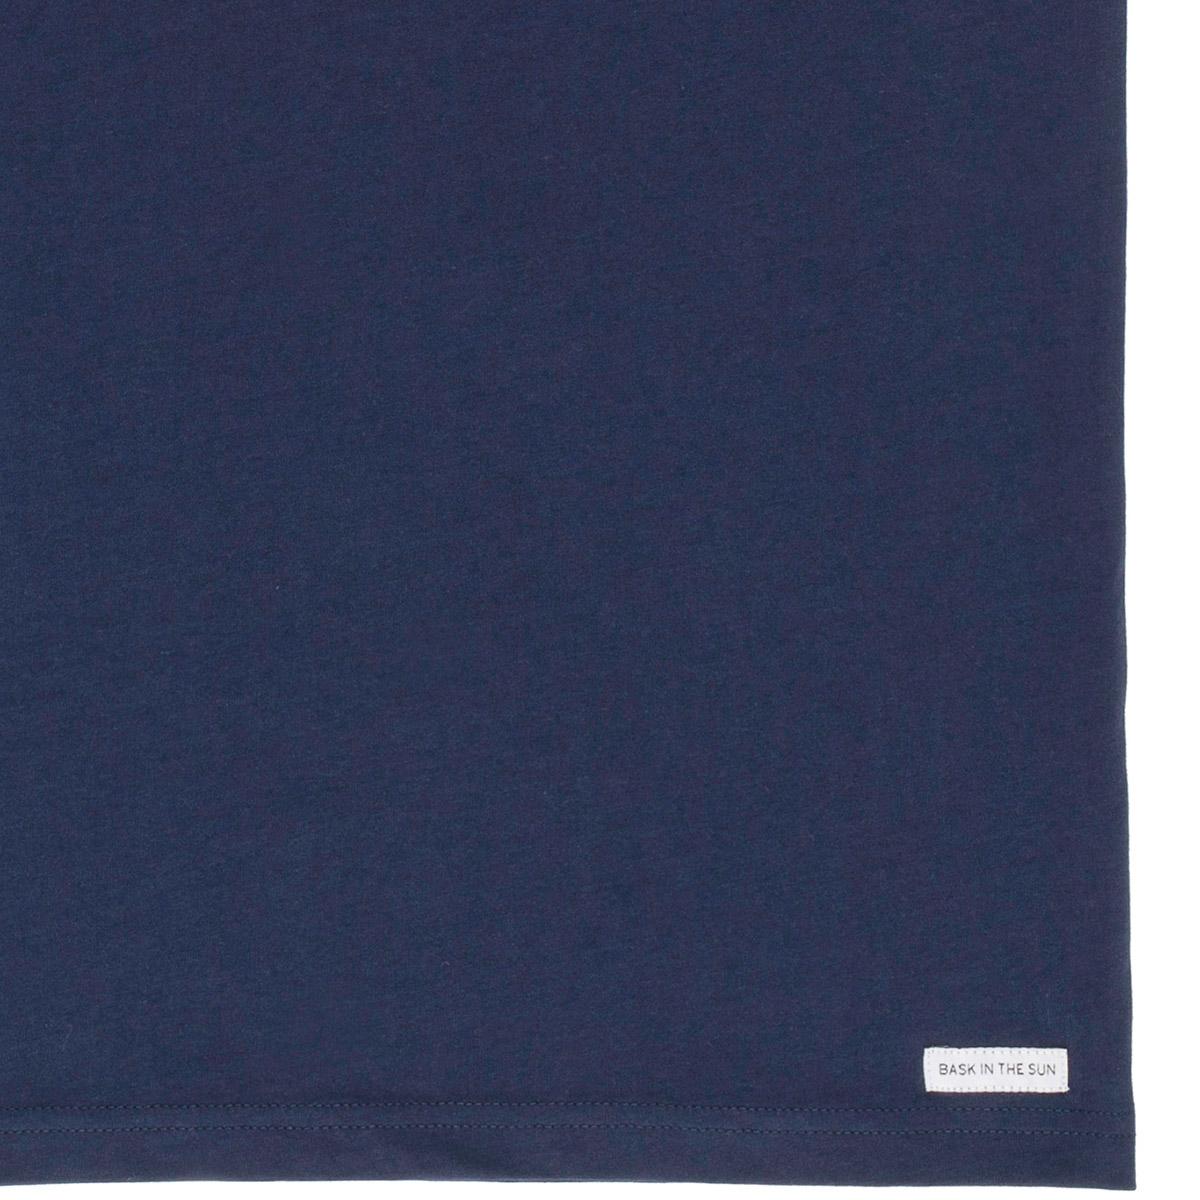 T-shirt en coton bio navy snakepark - Bask in the Sun num 3